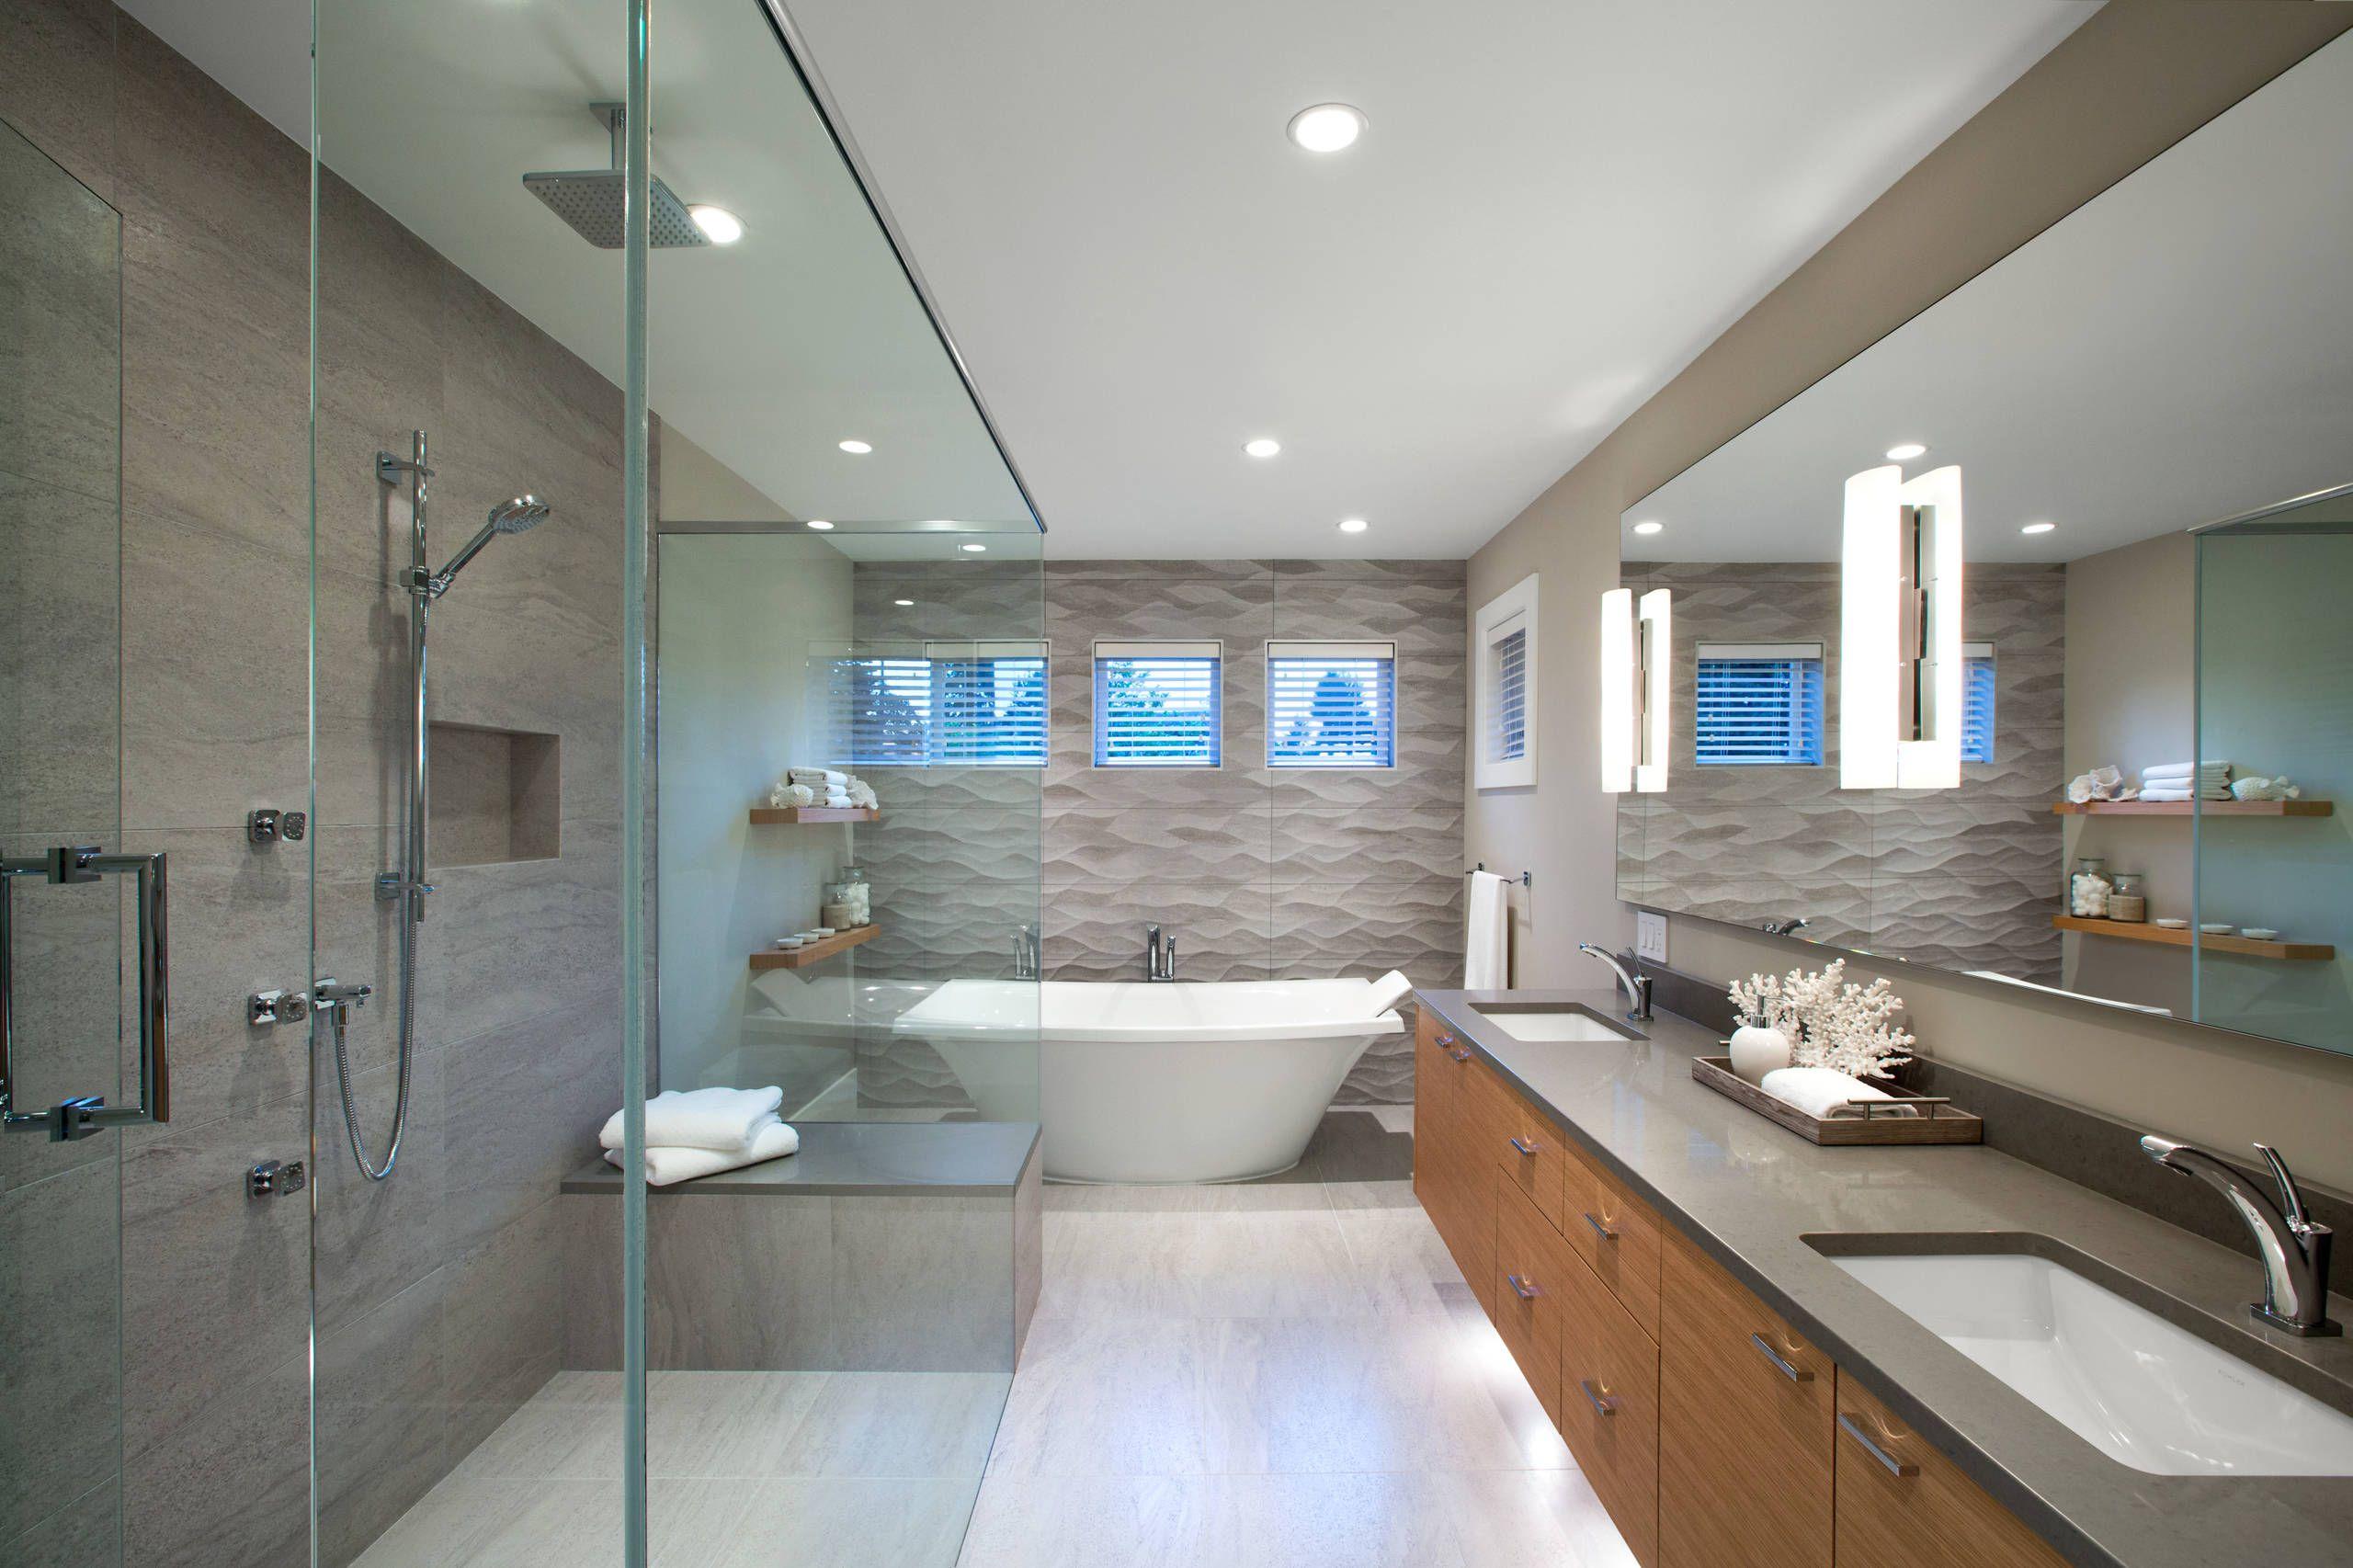 36 Chic Design Ideas For An Elegant Master Bathroom Home Awakening Quartz Bathroom Countertops Bathroom Countertops Bathroom Design